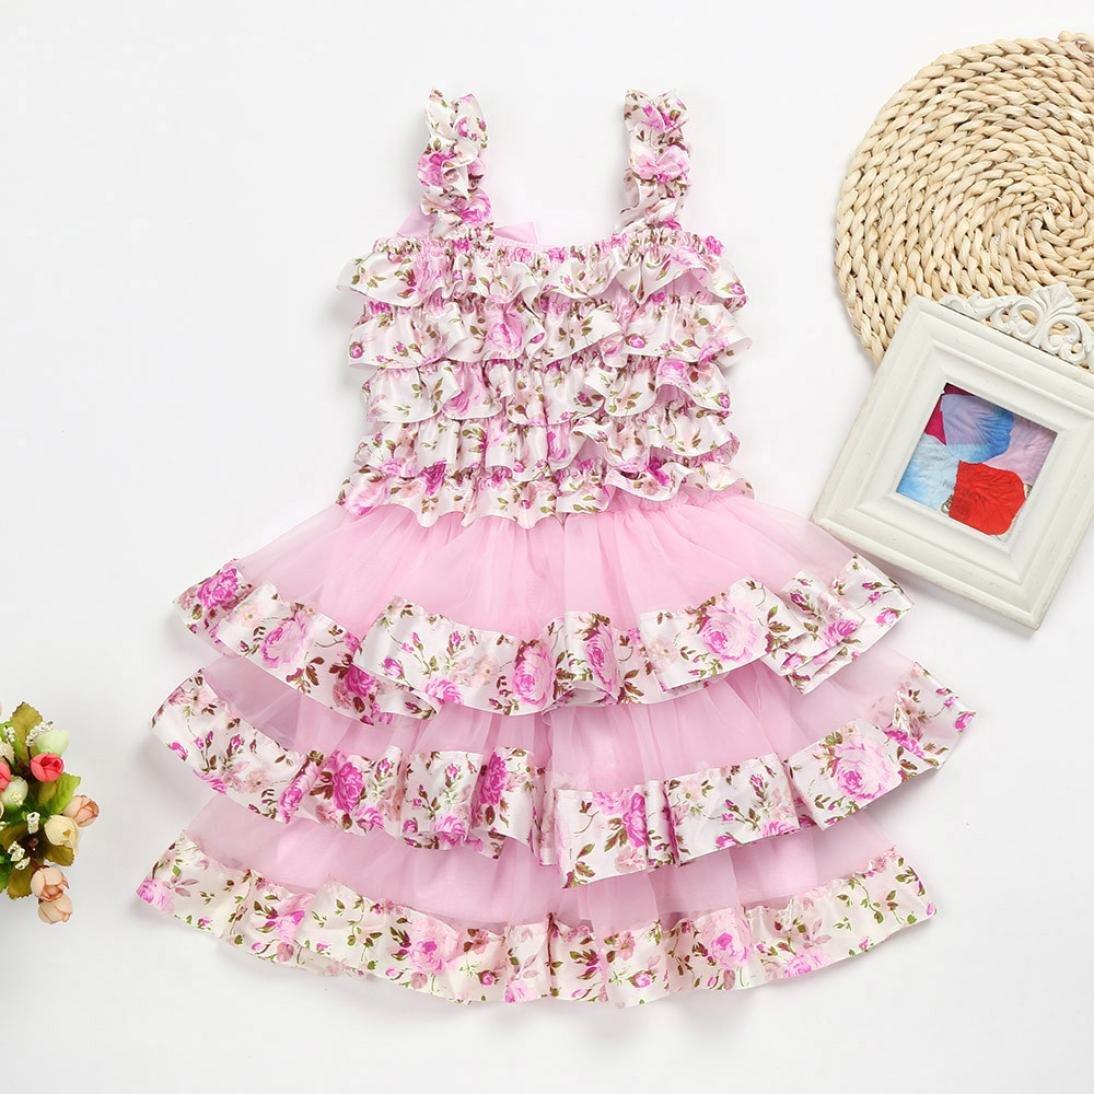 Wanshop Girl Dress Kids Lace Sleeveless Layered Princess Dress Summer Party Casual Pretty Dresses Age 2-6 Years